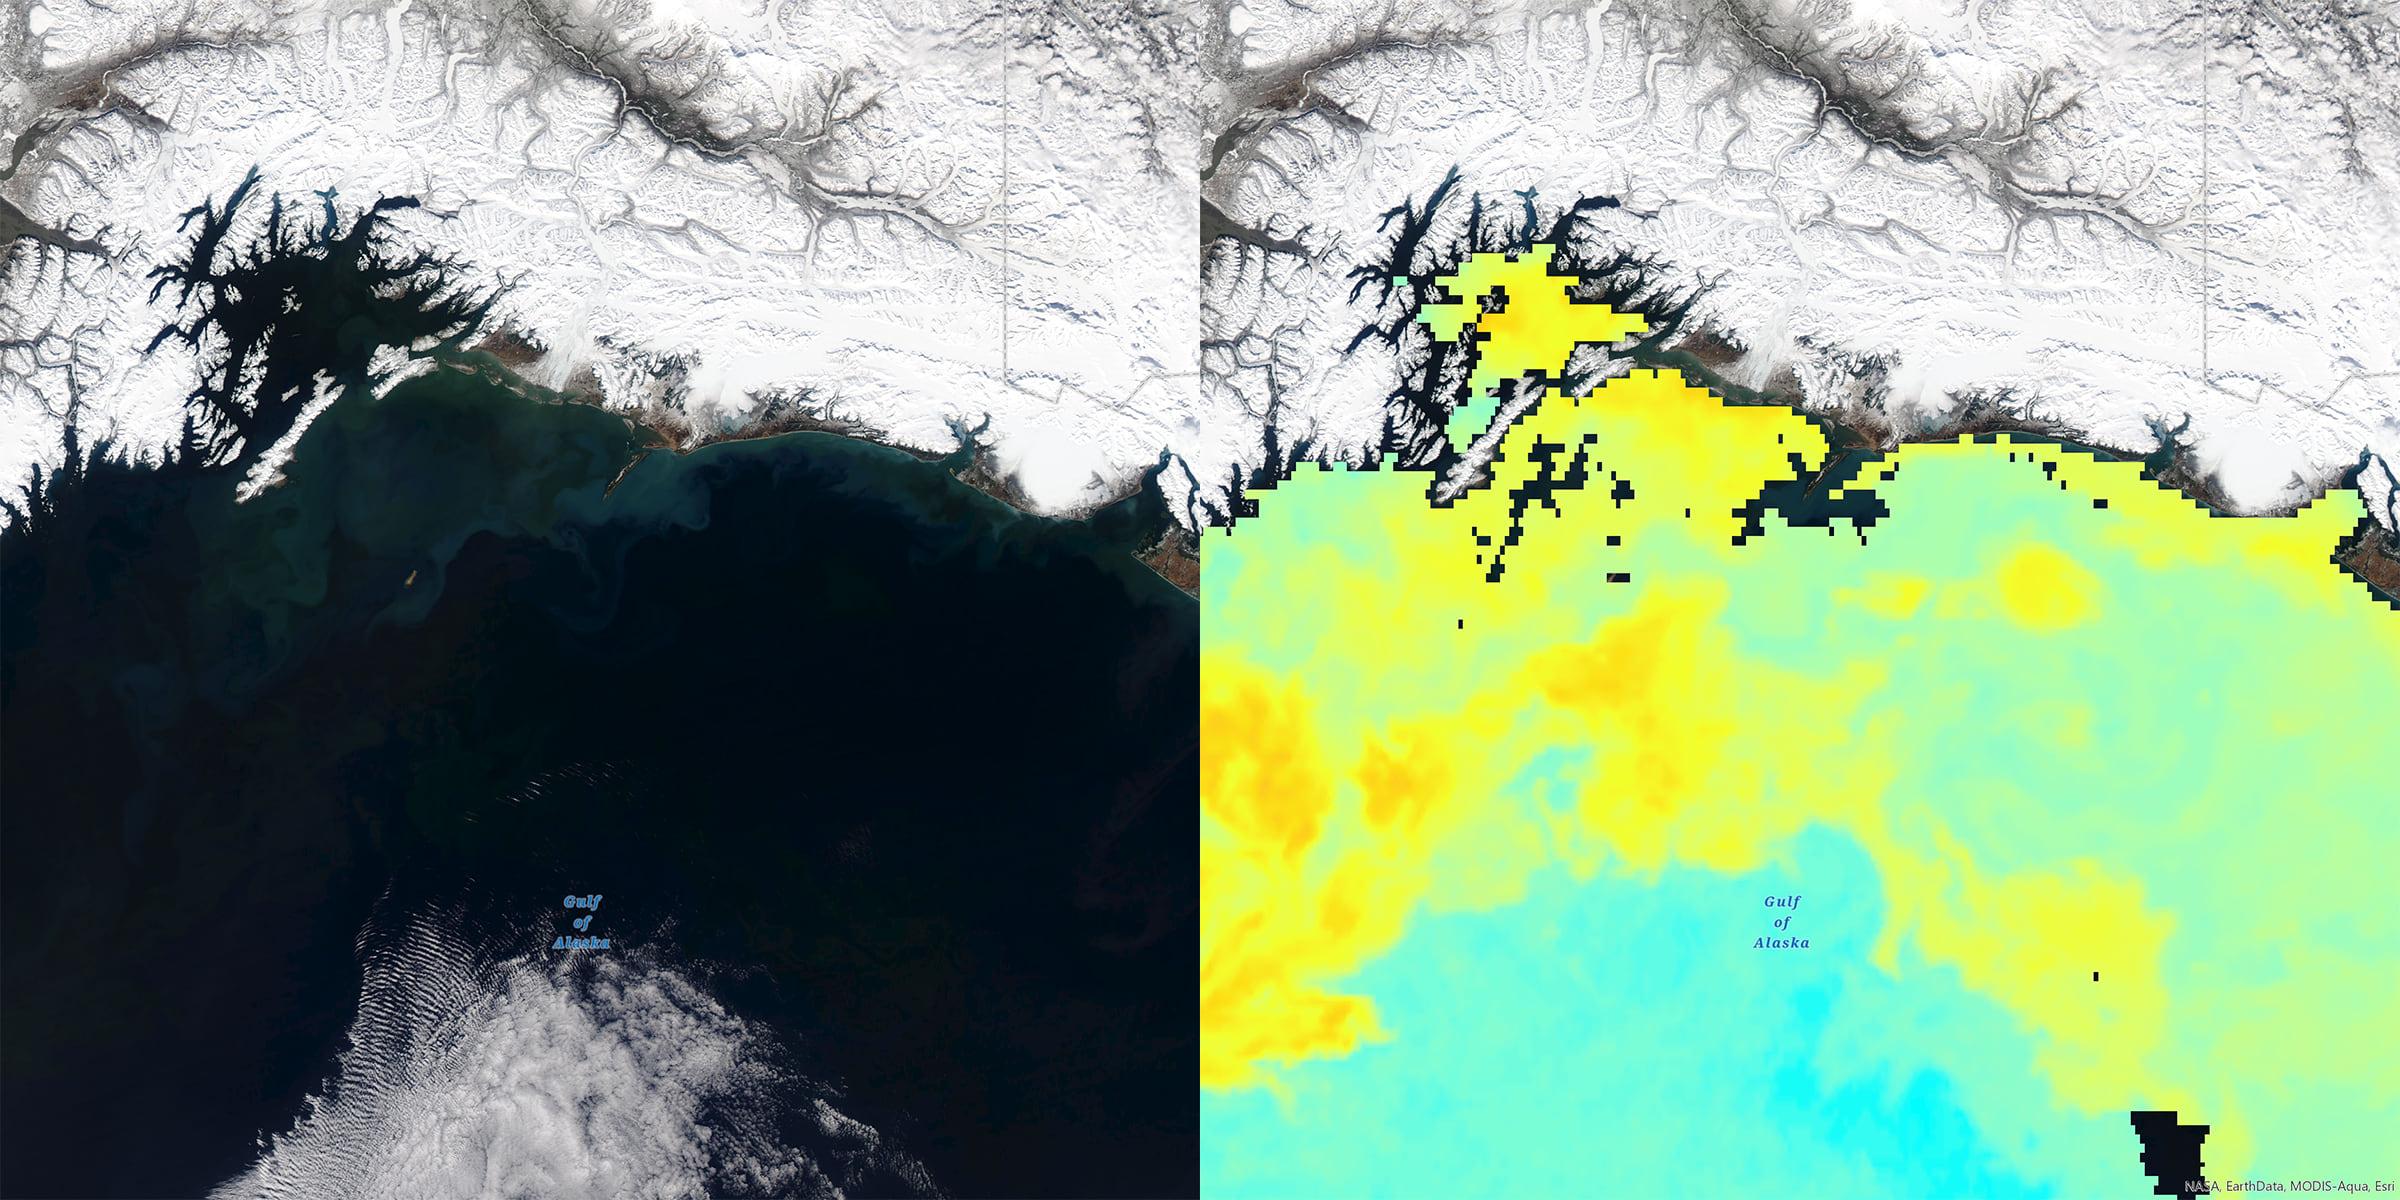 http://Chlorophyll,%20Phytoplankton%20Bloom,%20Gulf%20of%20Alaska